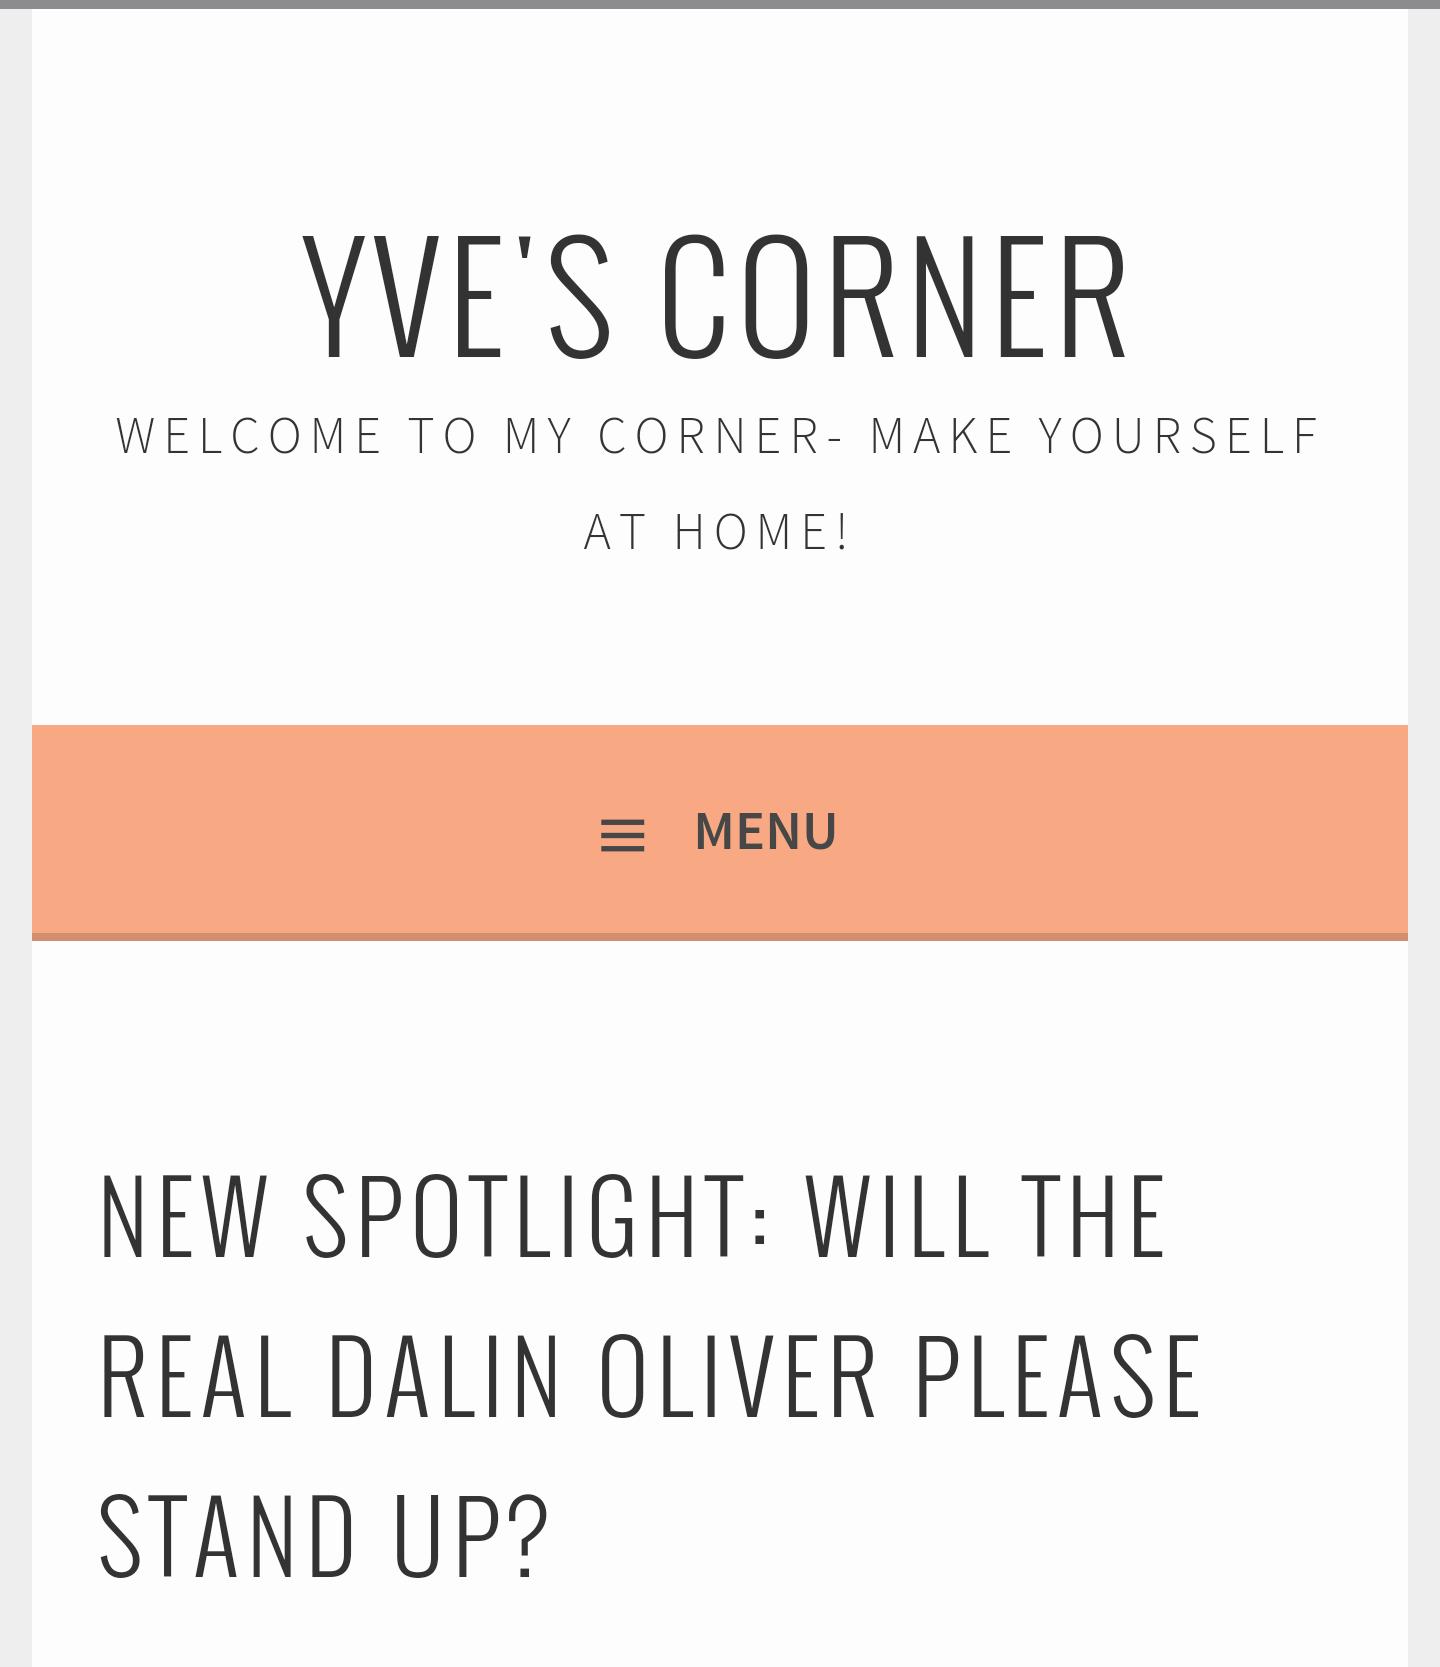 eves corner